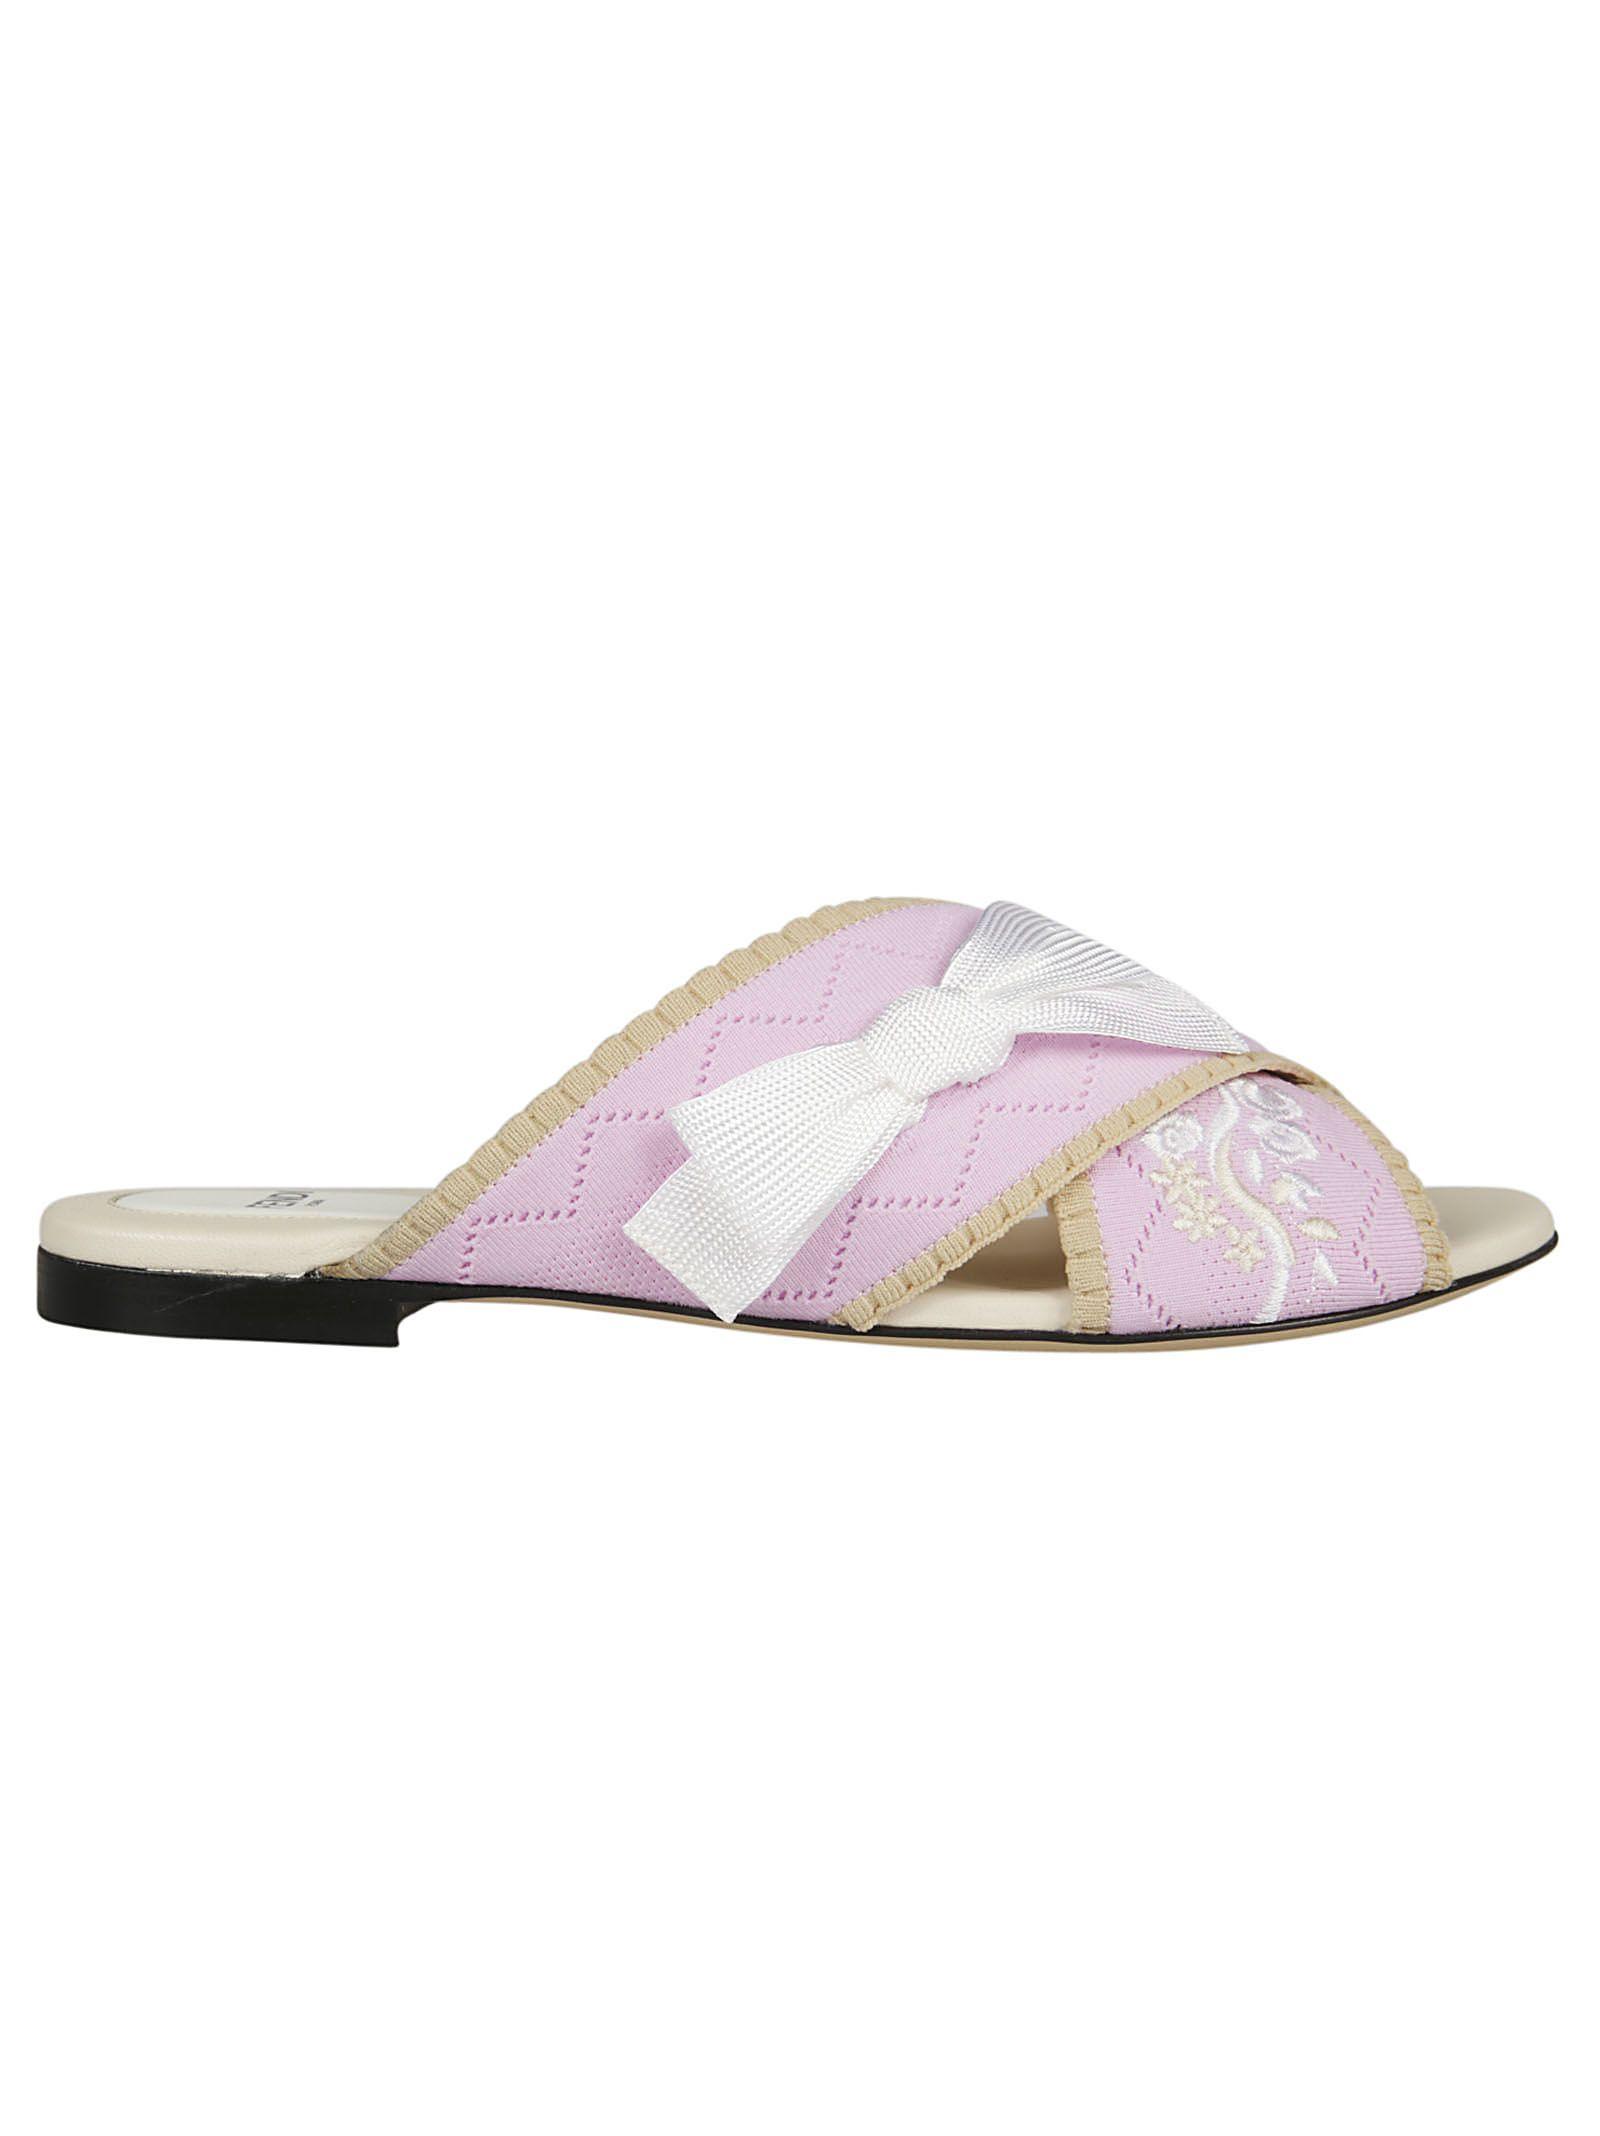 Fendi Floral Embroidered Flat Sandals